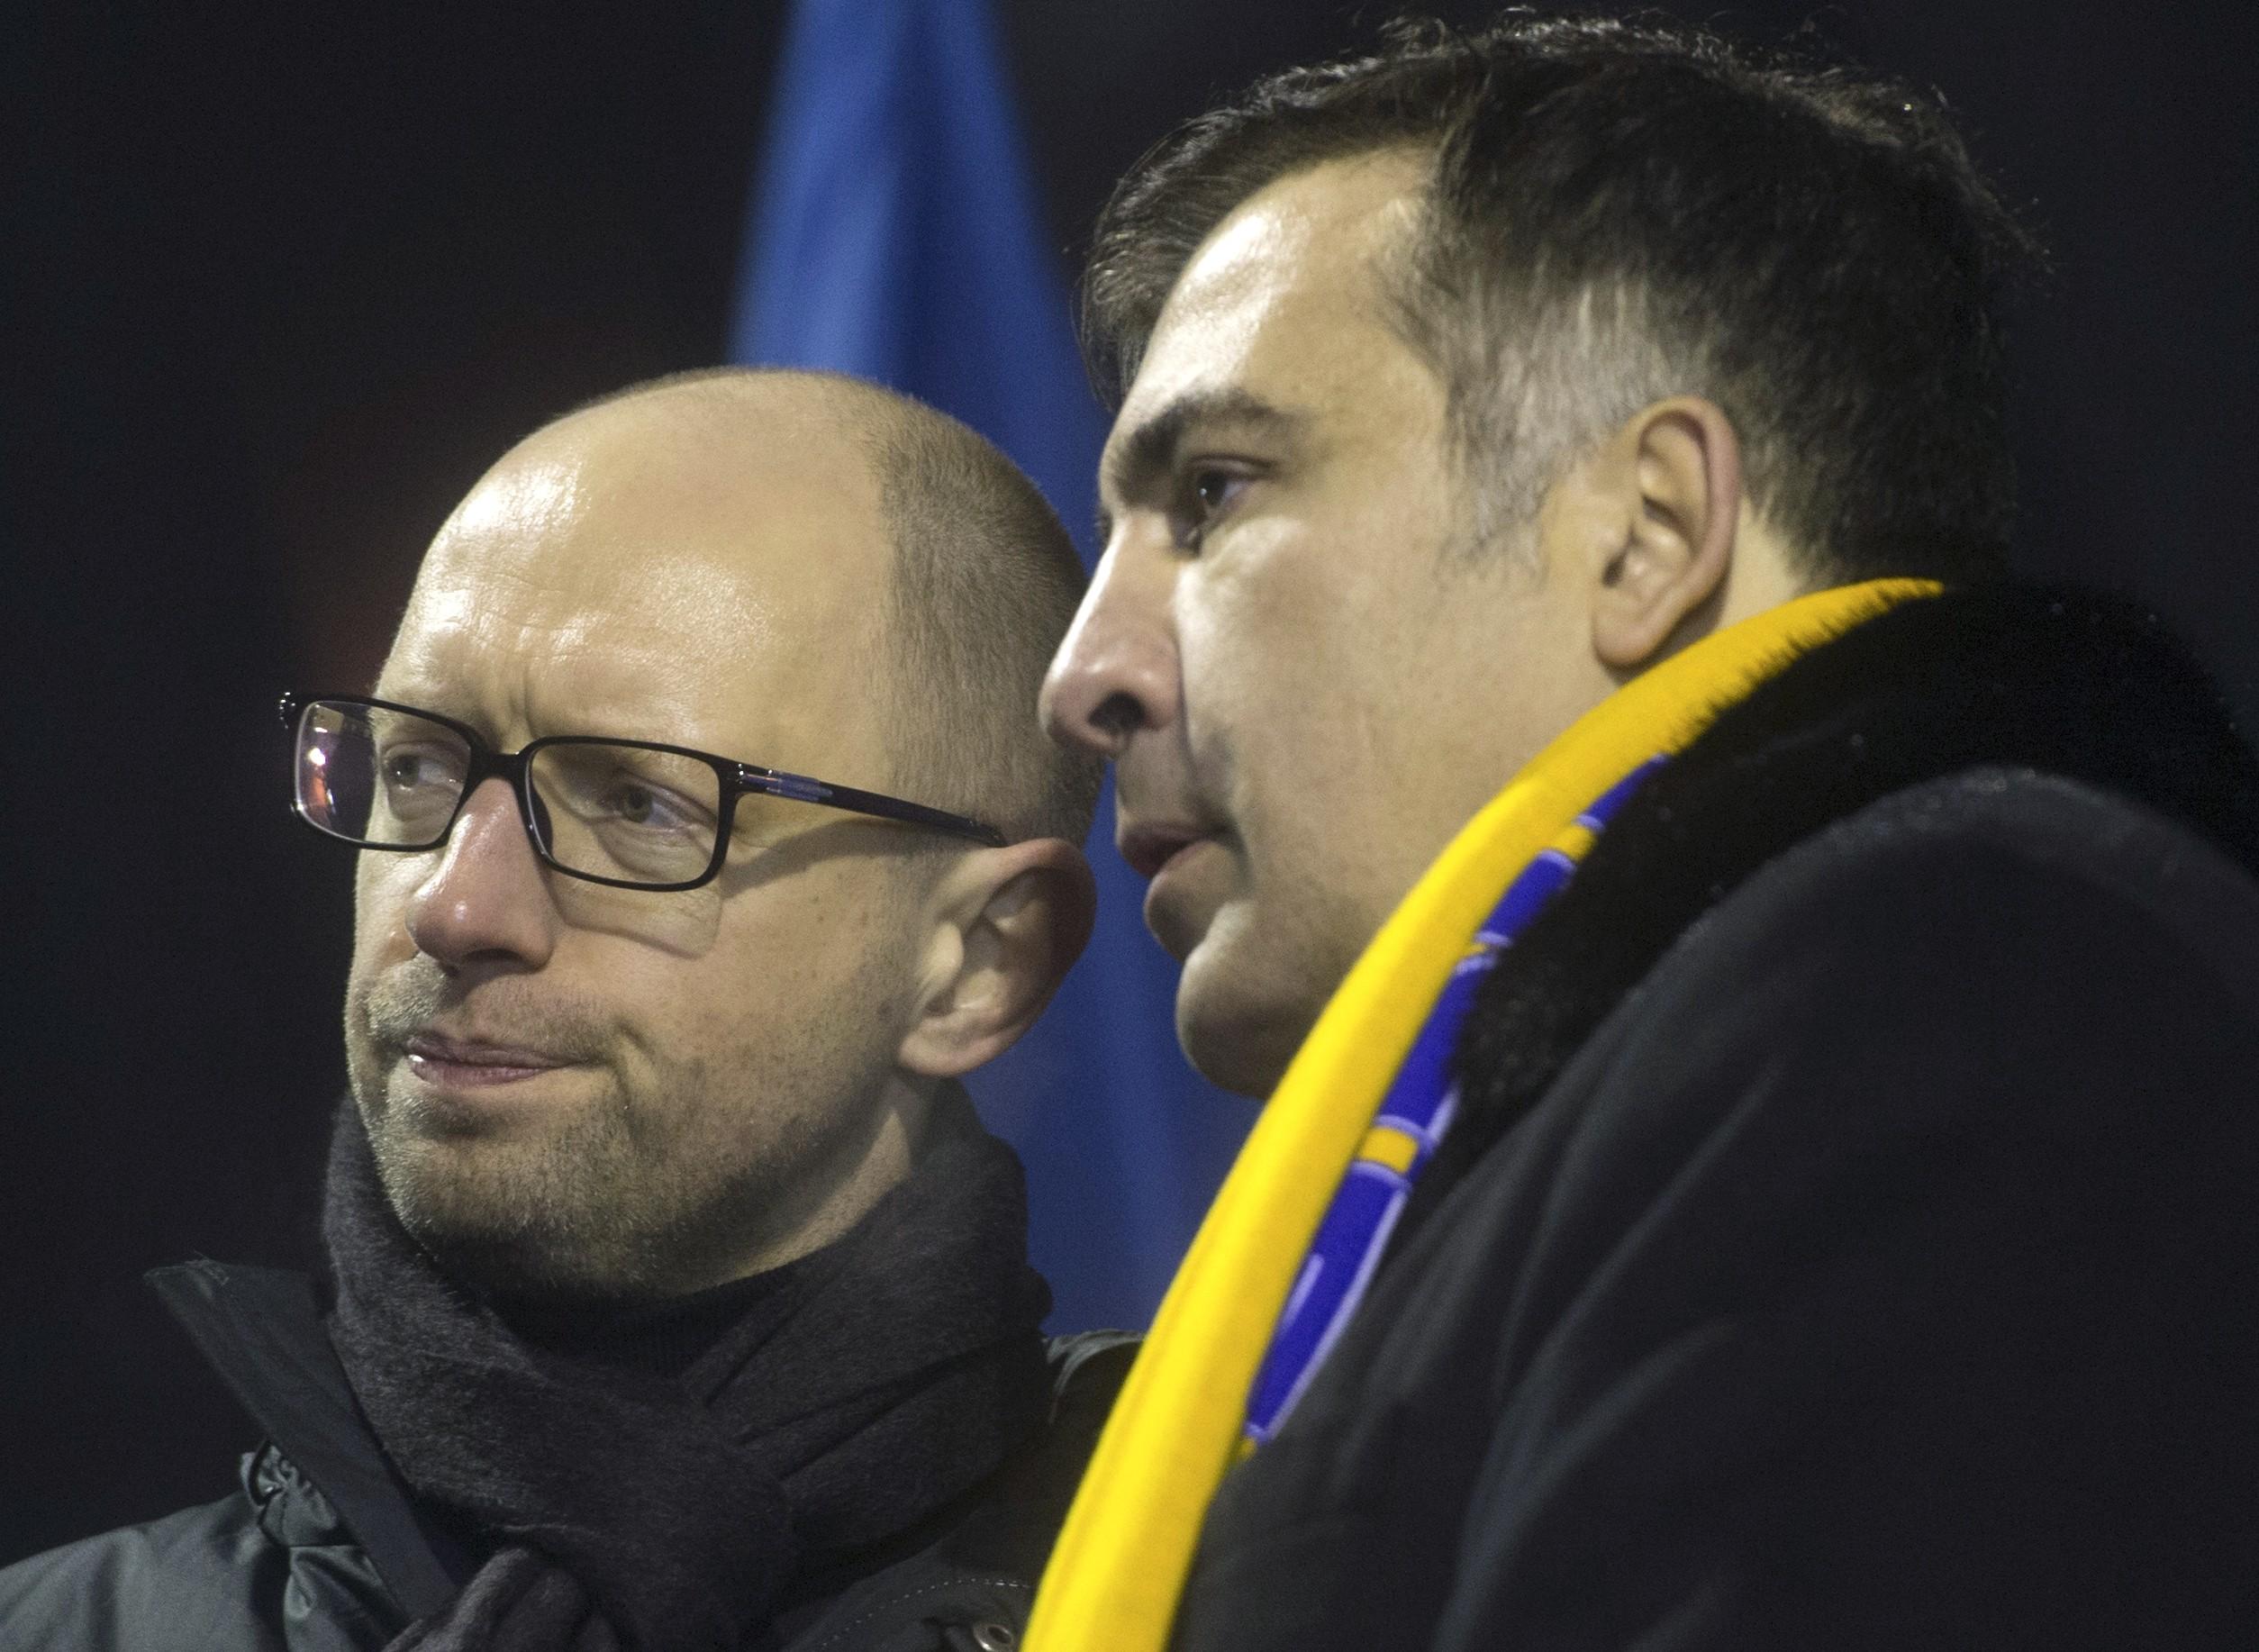 <p>Арсений Яценюк (слева) и Михаил Саакашвили (справа). Фото: &copy;РИА Новости/Илья Питалев</p>